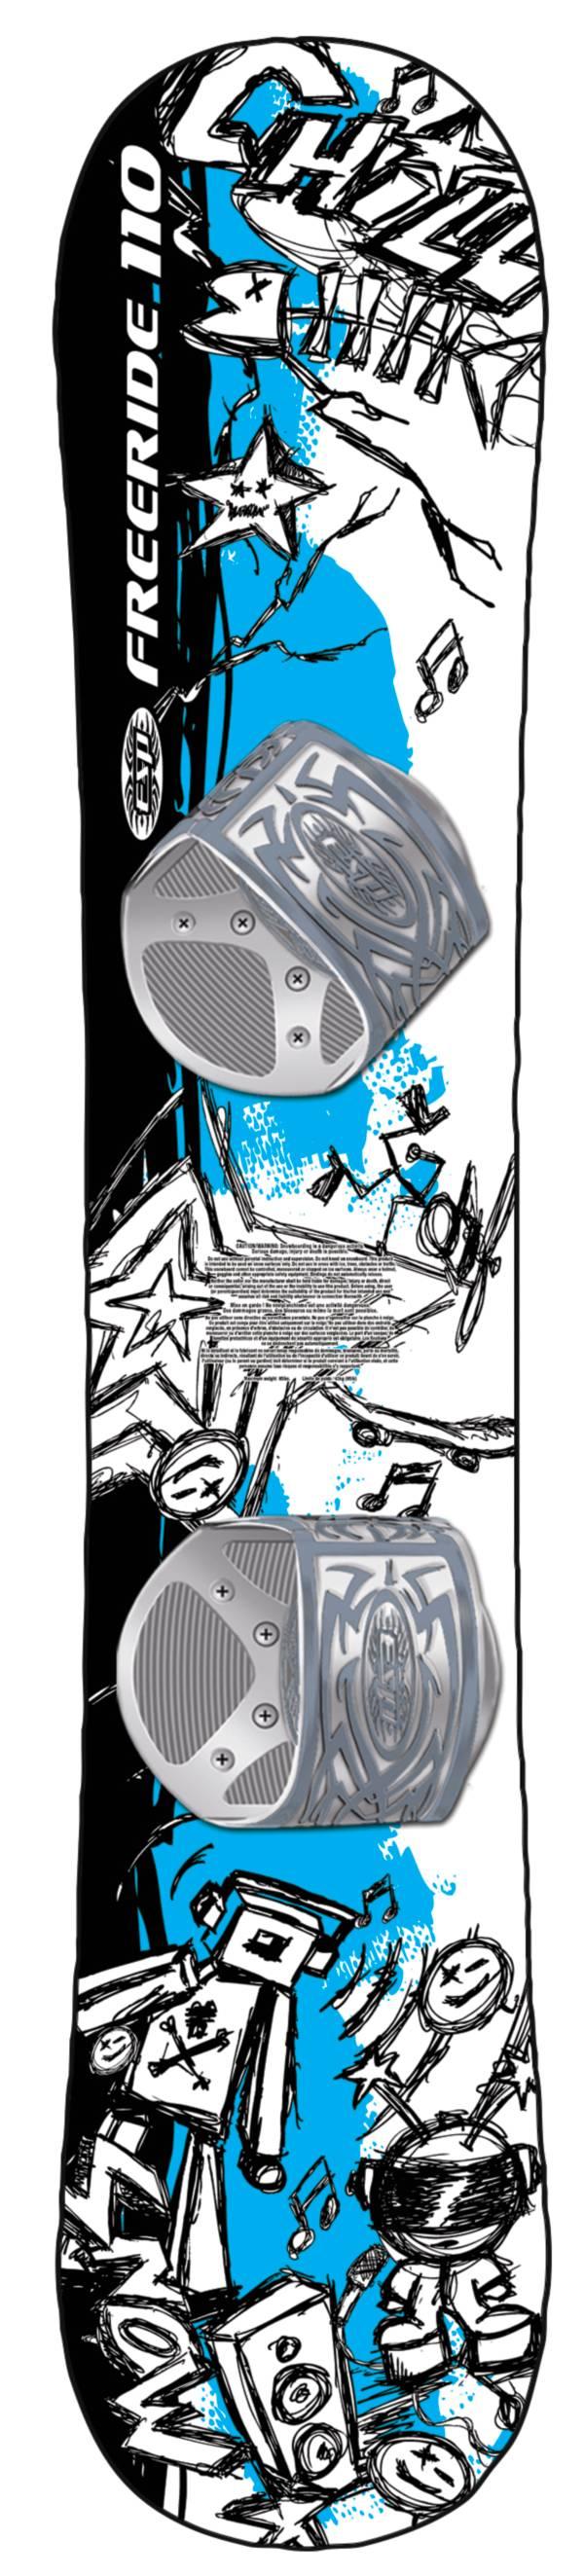 ESP Graffiti Toy Snowboard product image